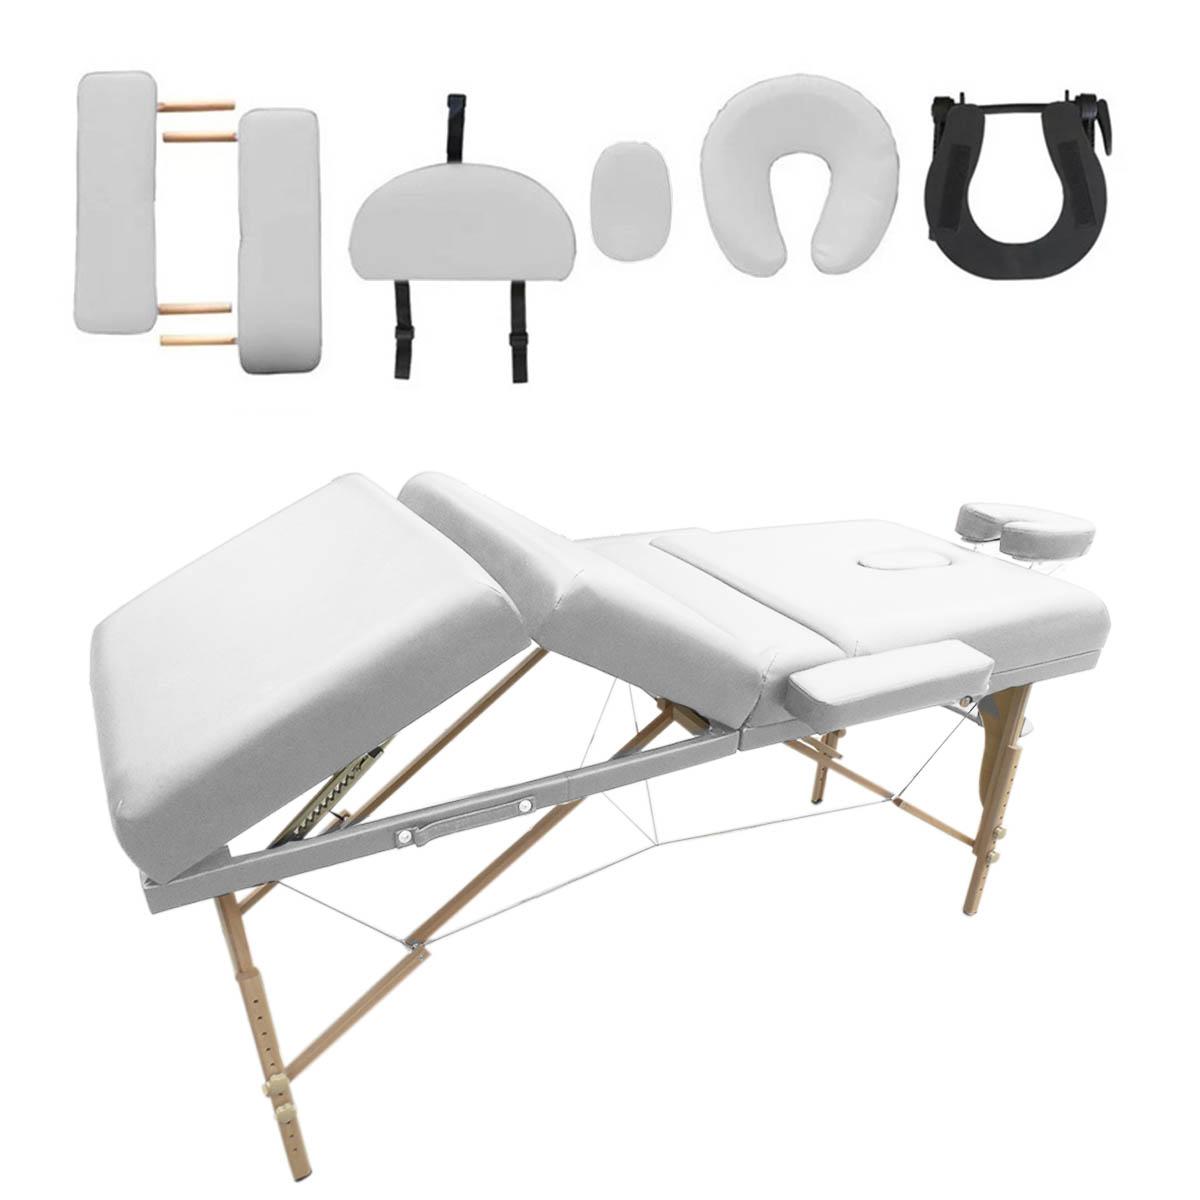 Cama Masaje Blanca 4 Secciones Plegable Spa Terapia Madera